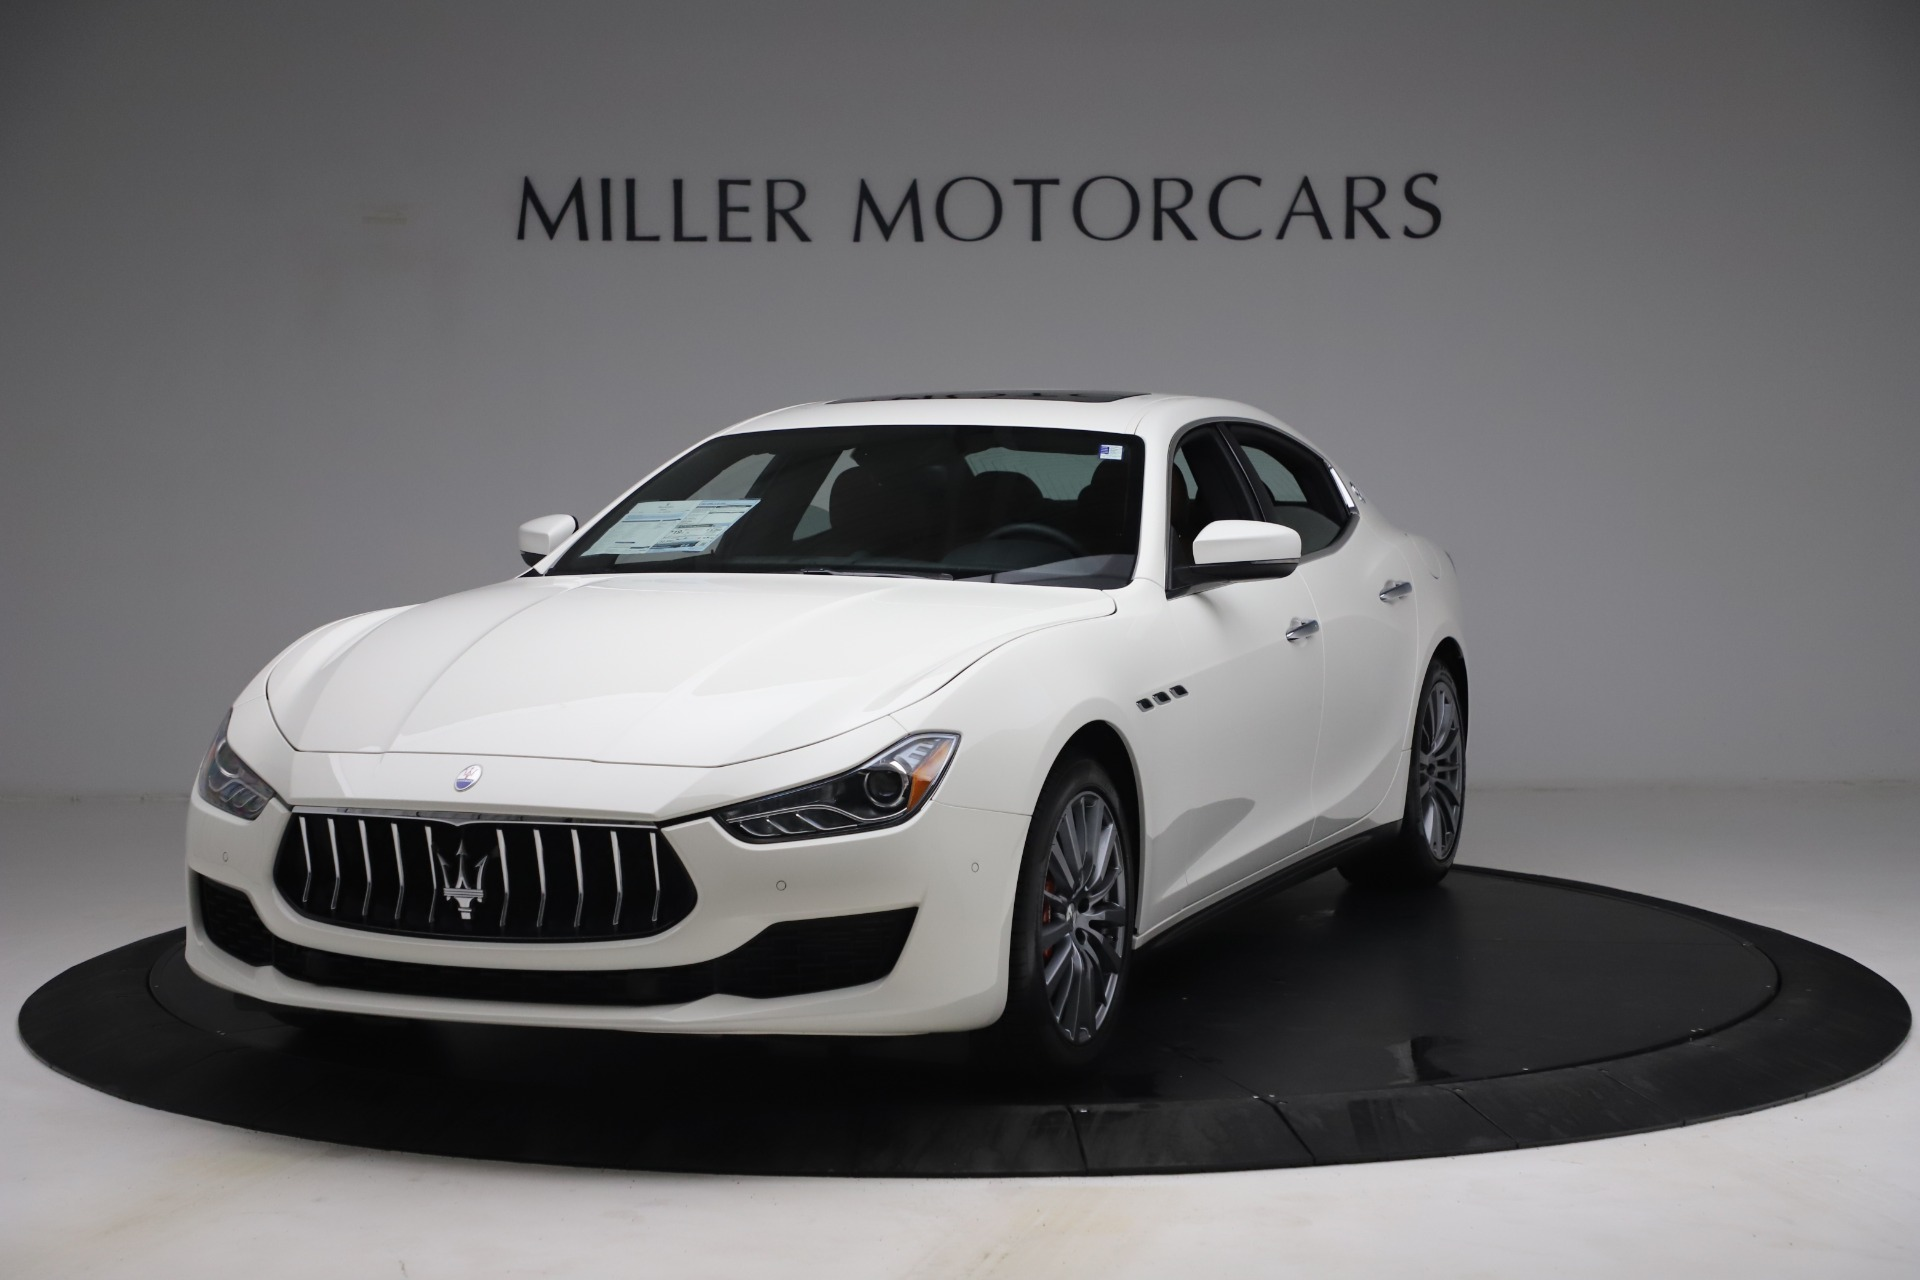 New 2021 Maserati Ghibli SQ4 for sale $85,804 at Bentley Greenwich in Greenwich CT 06830 1